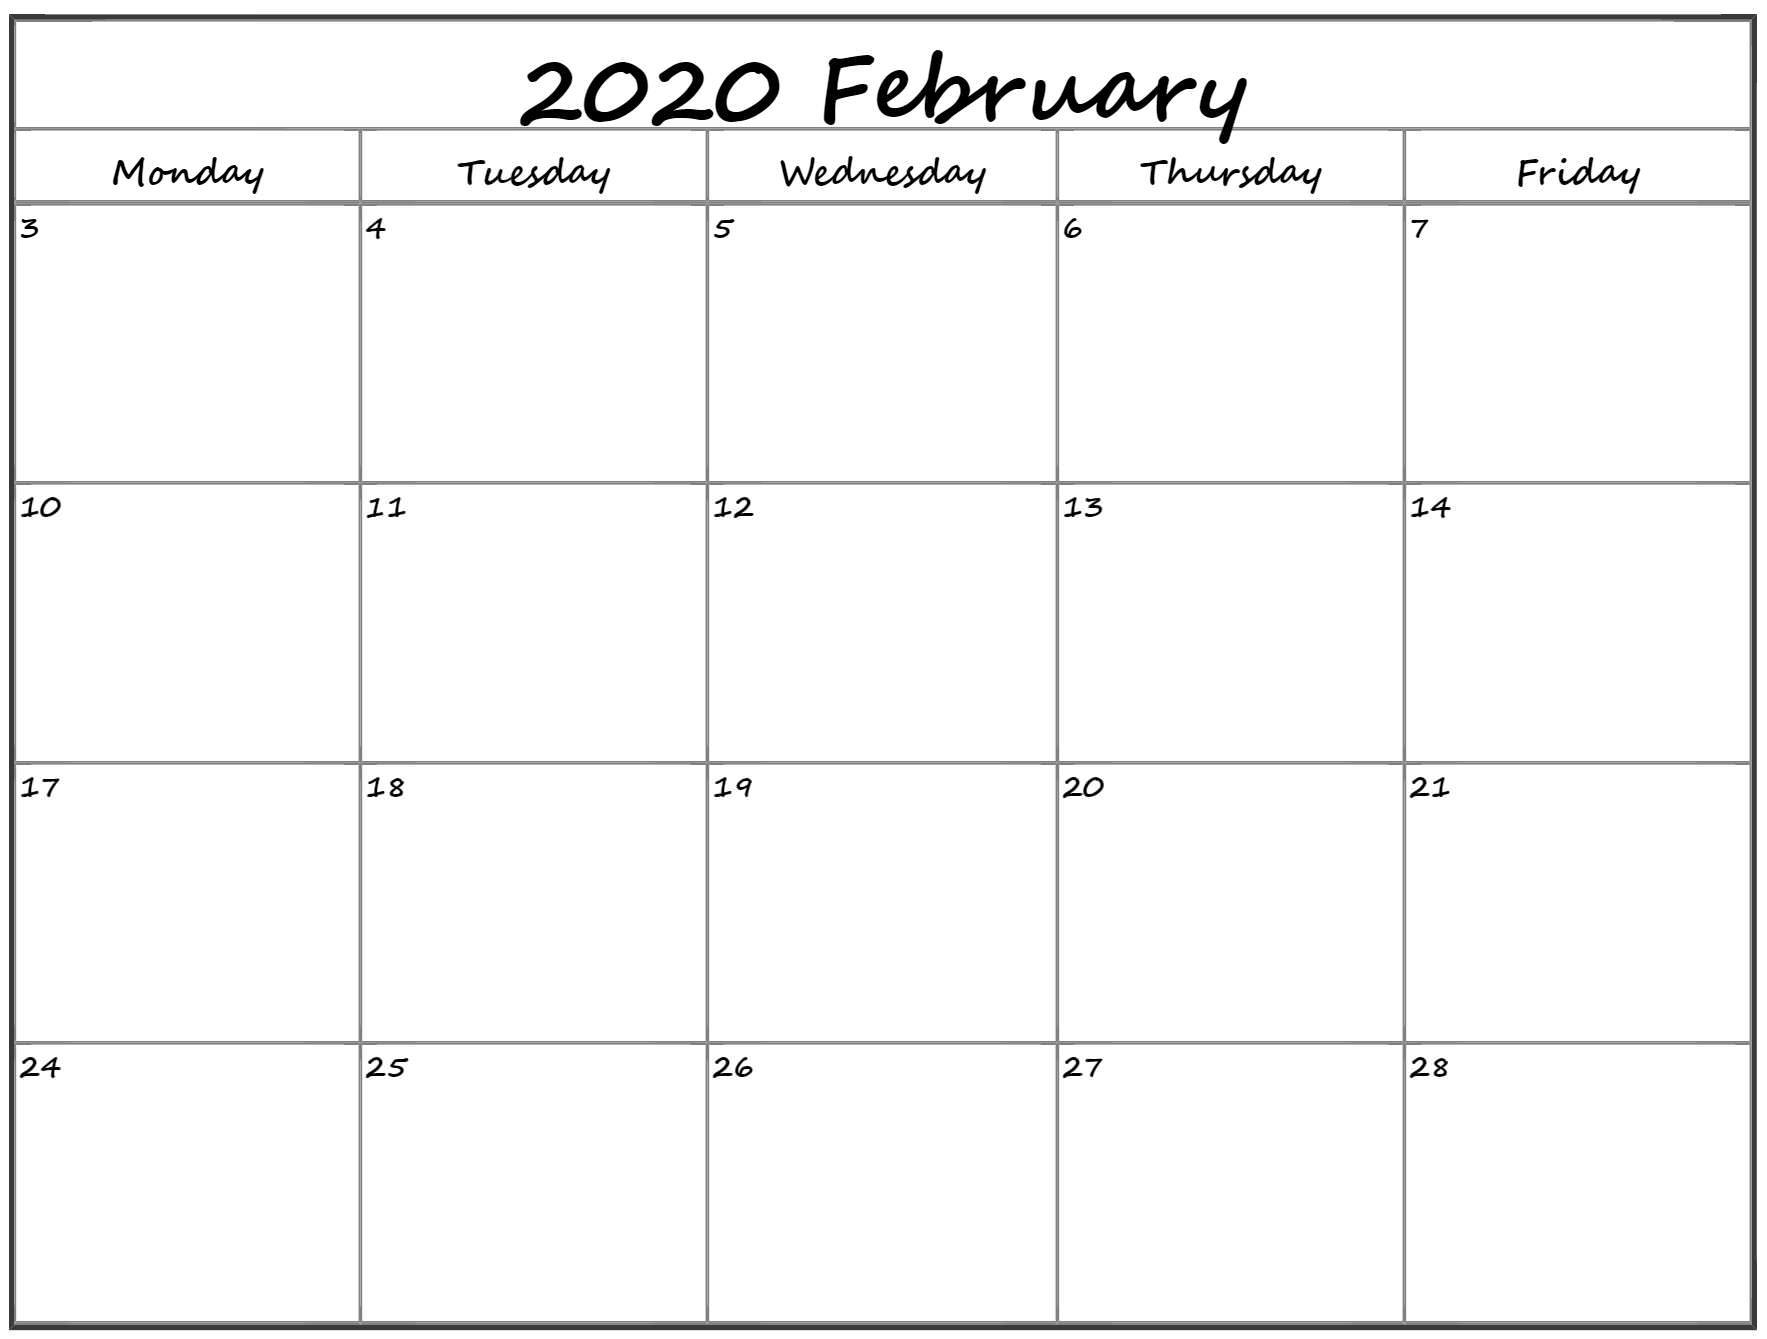 February 2020 Monday Calendar | Monday To Sunday for Free Printable Calendar Monday Through Friday